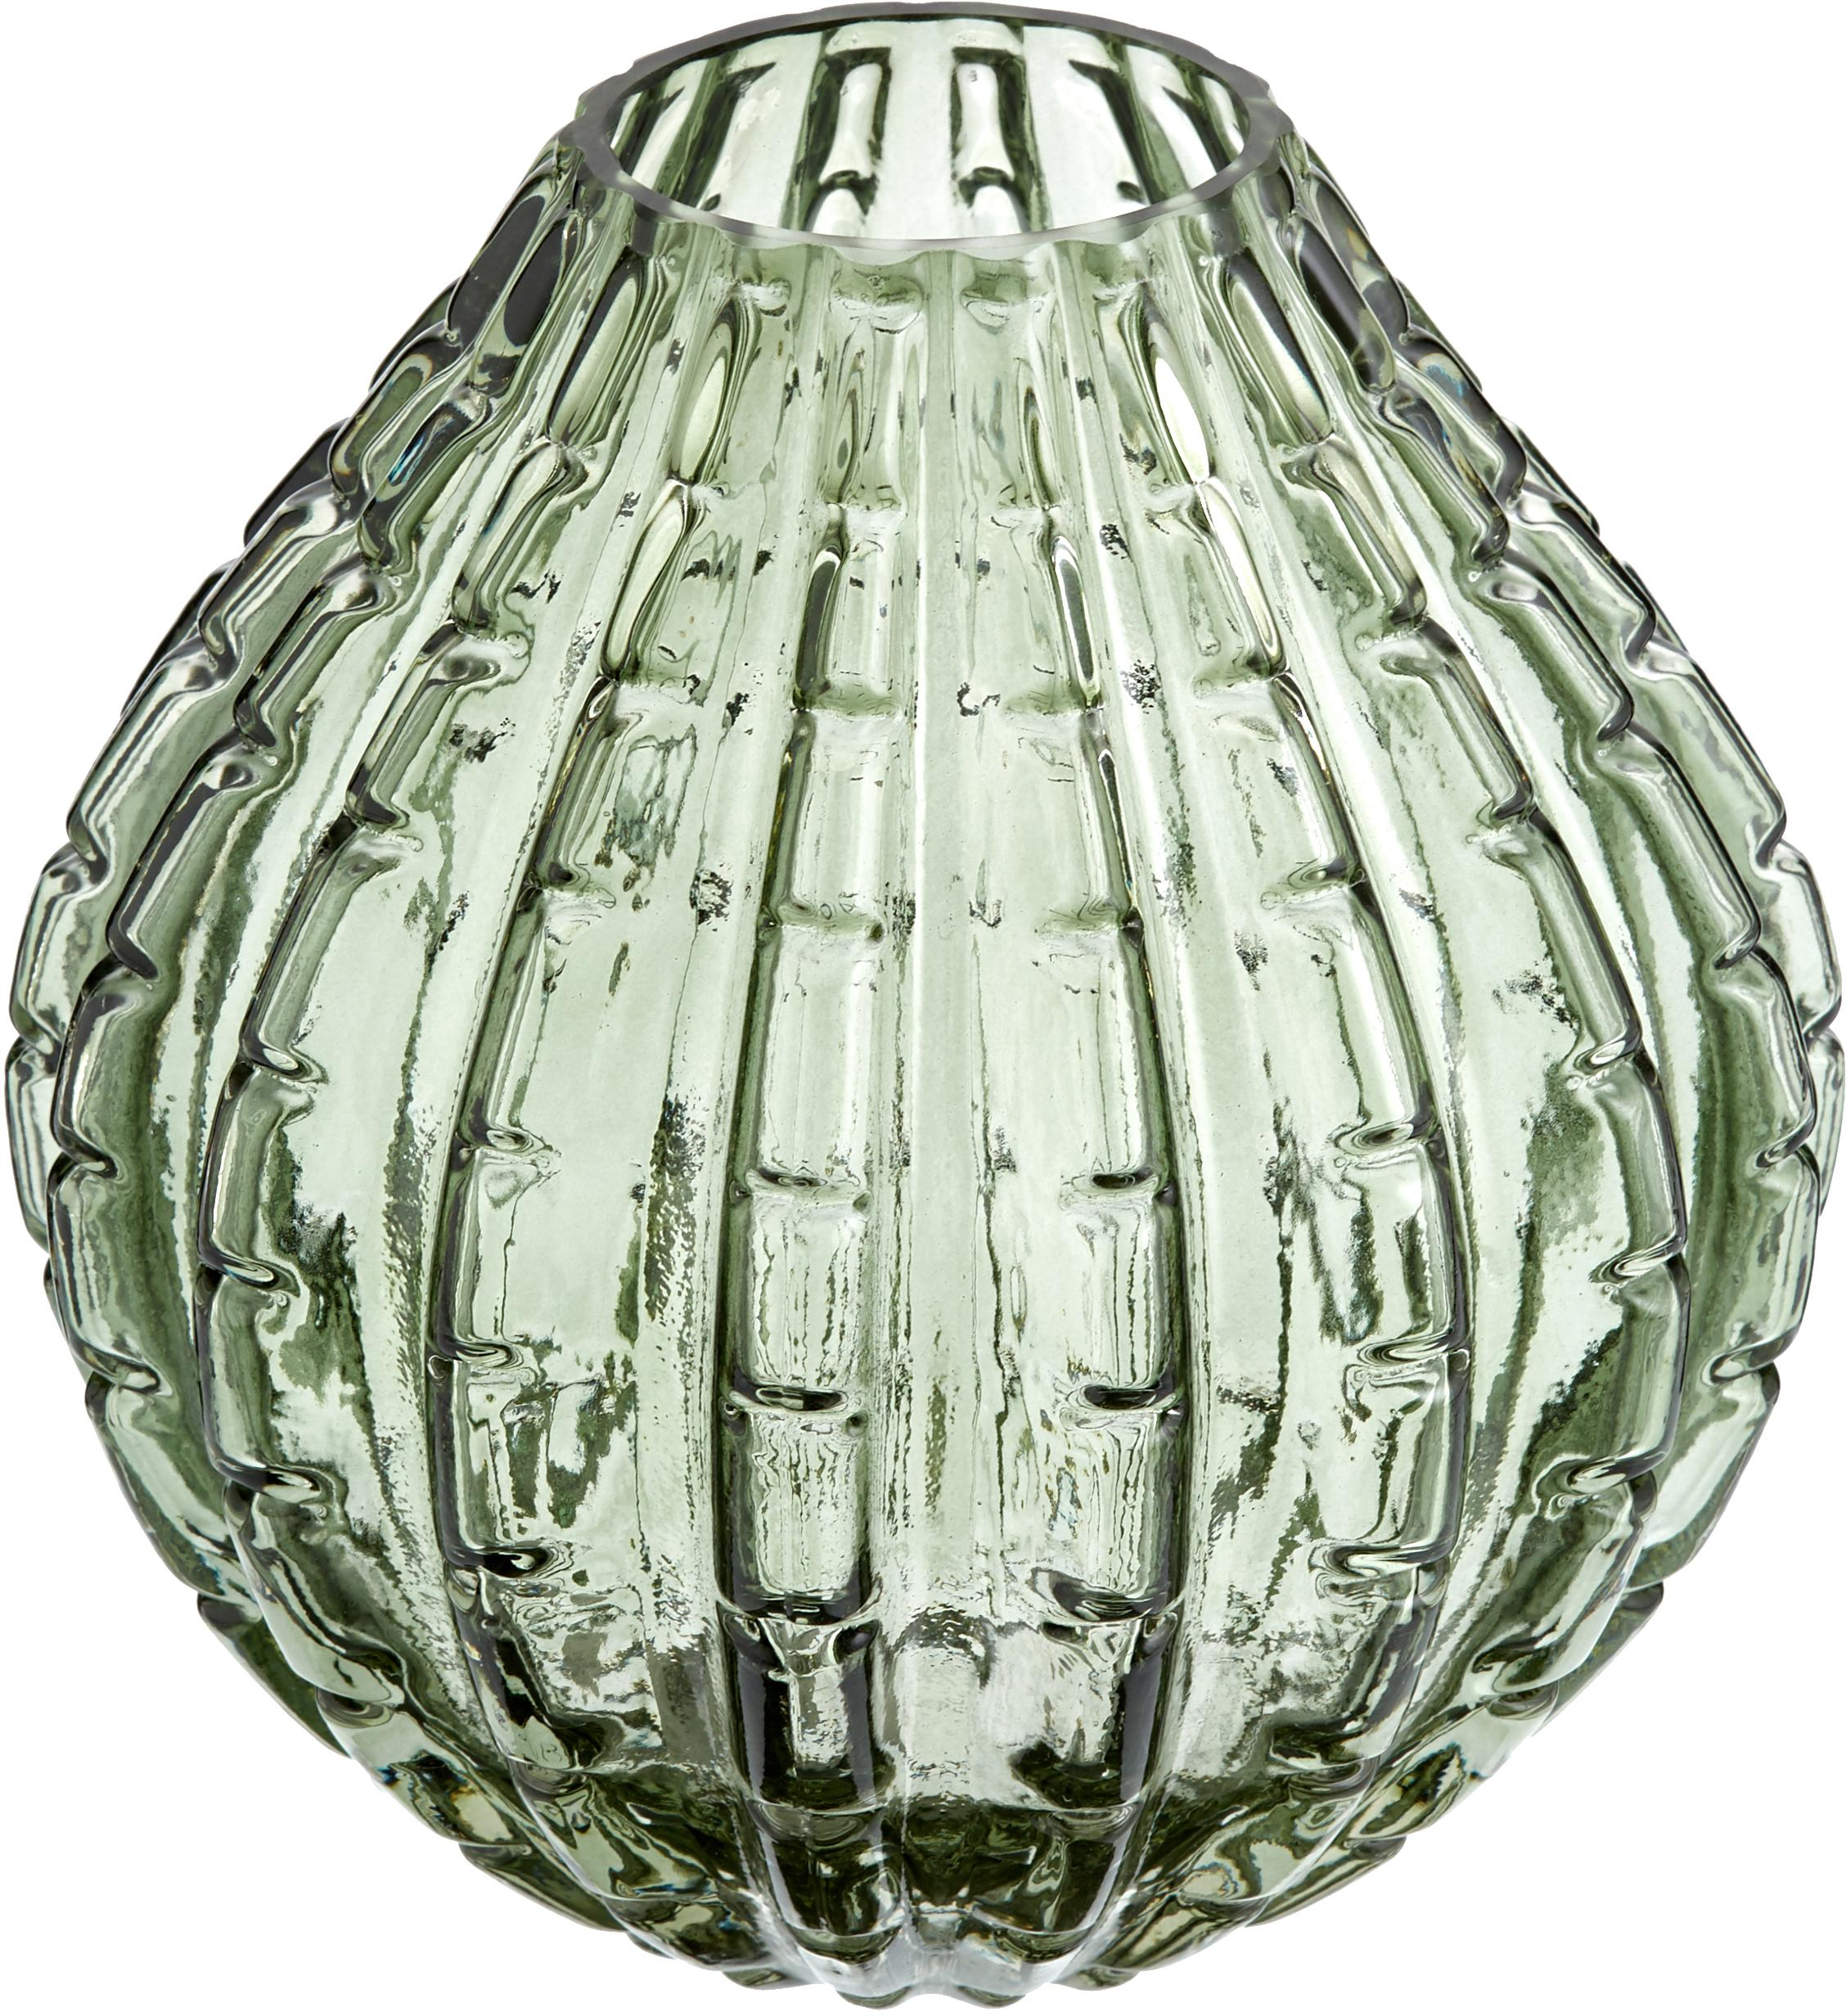 Vaso in vetro verde Lioba, Vetro, Verde, Ø 15 x Alt. 17 cm